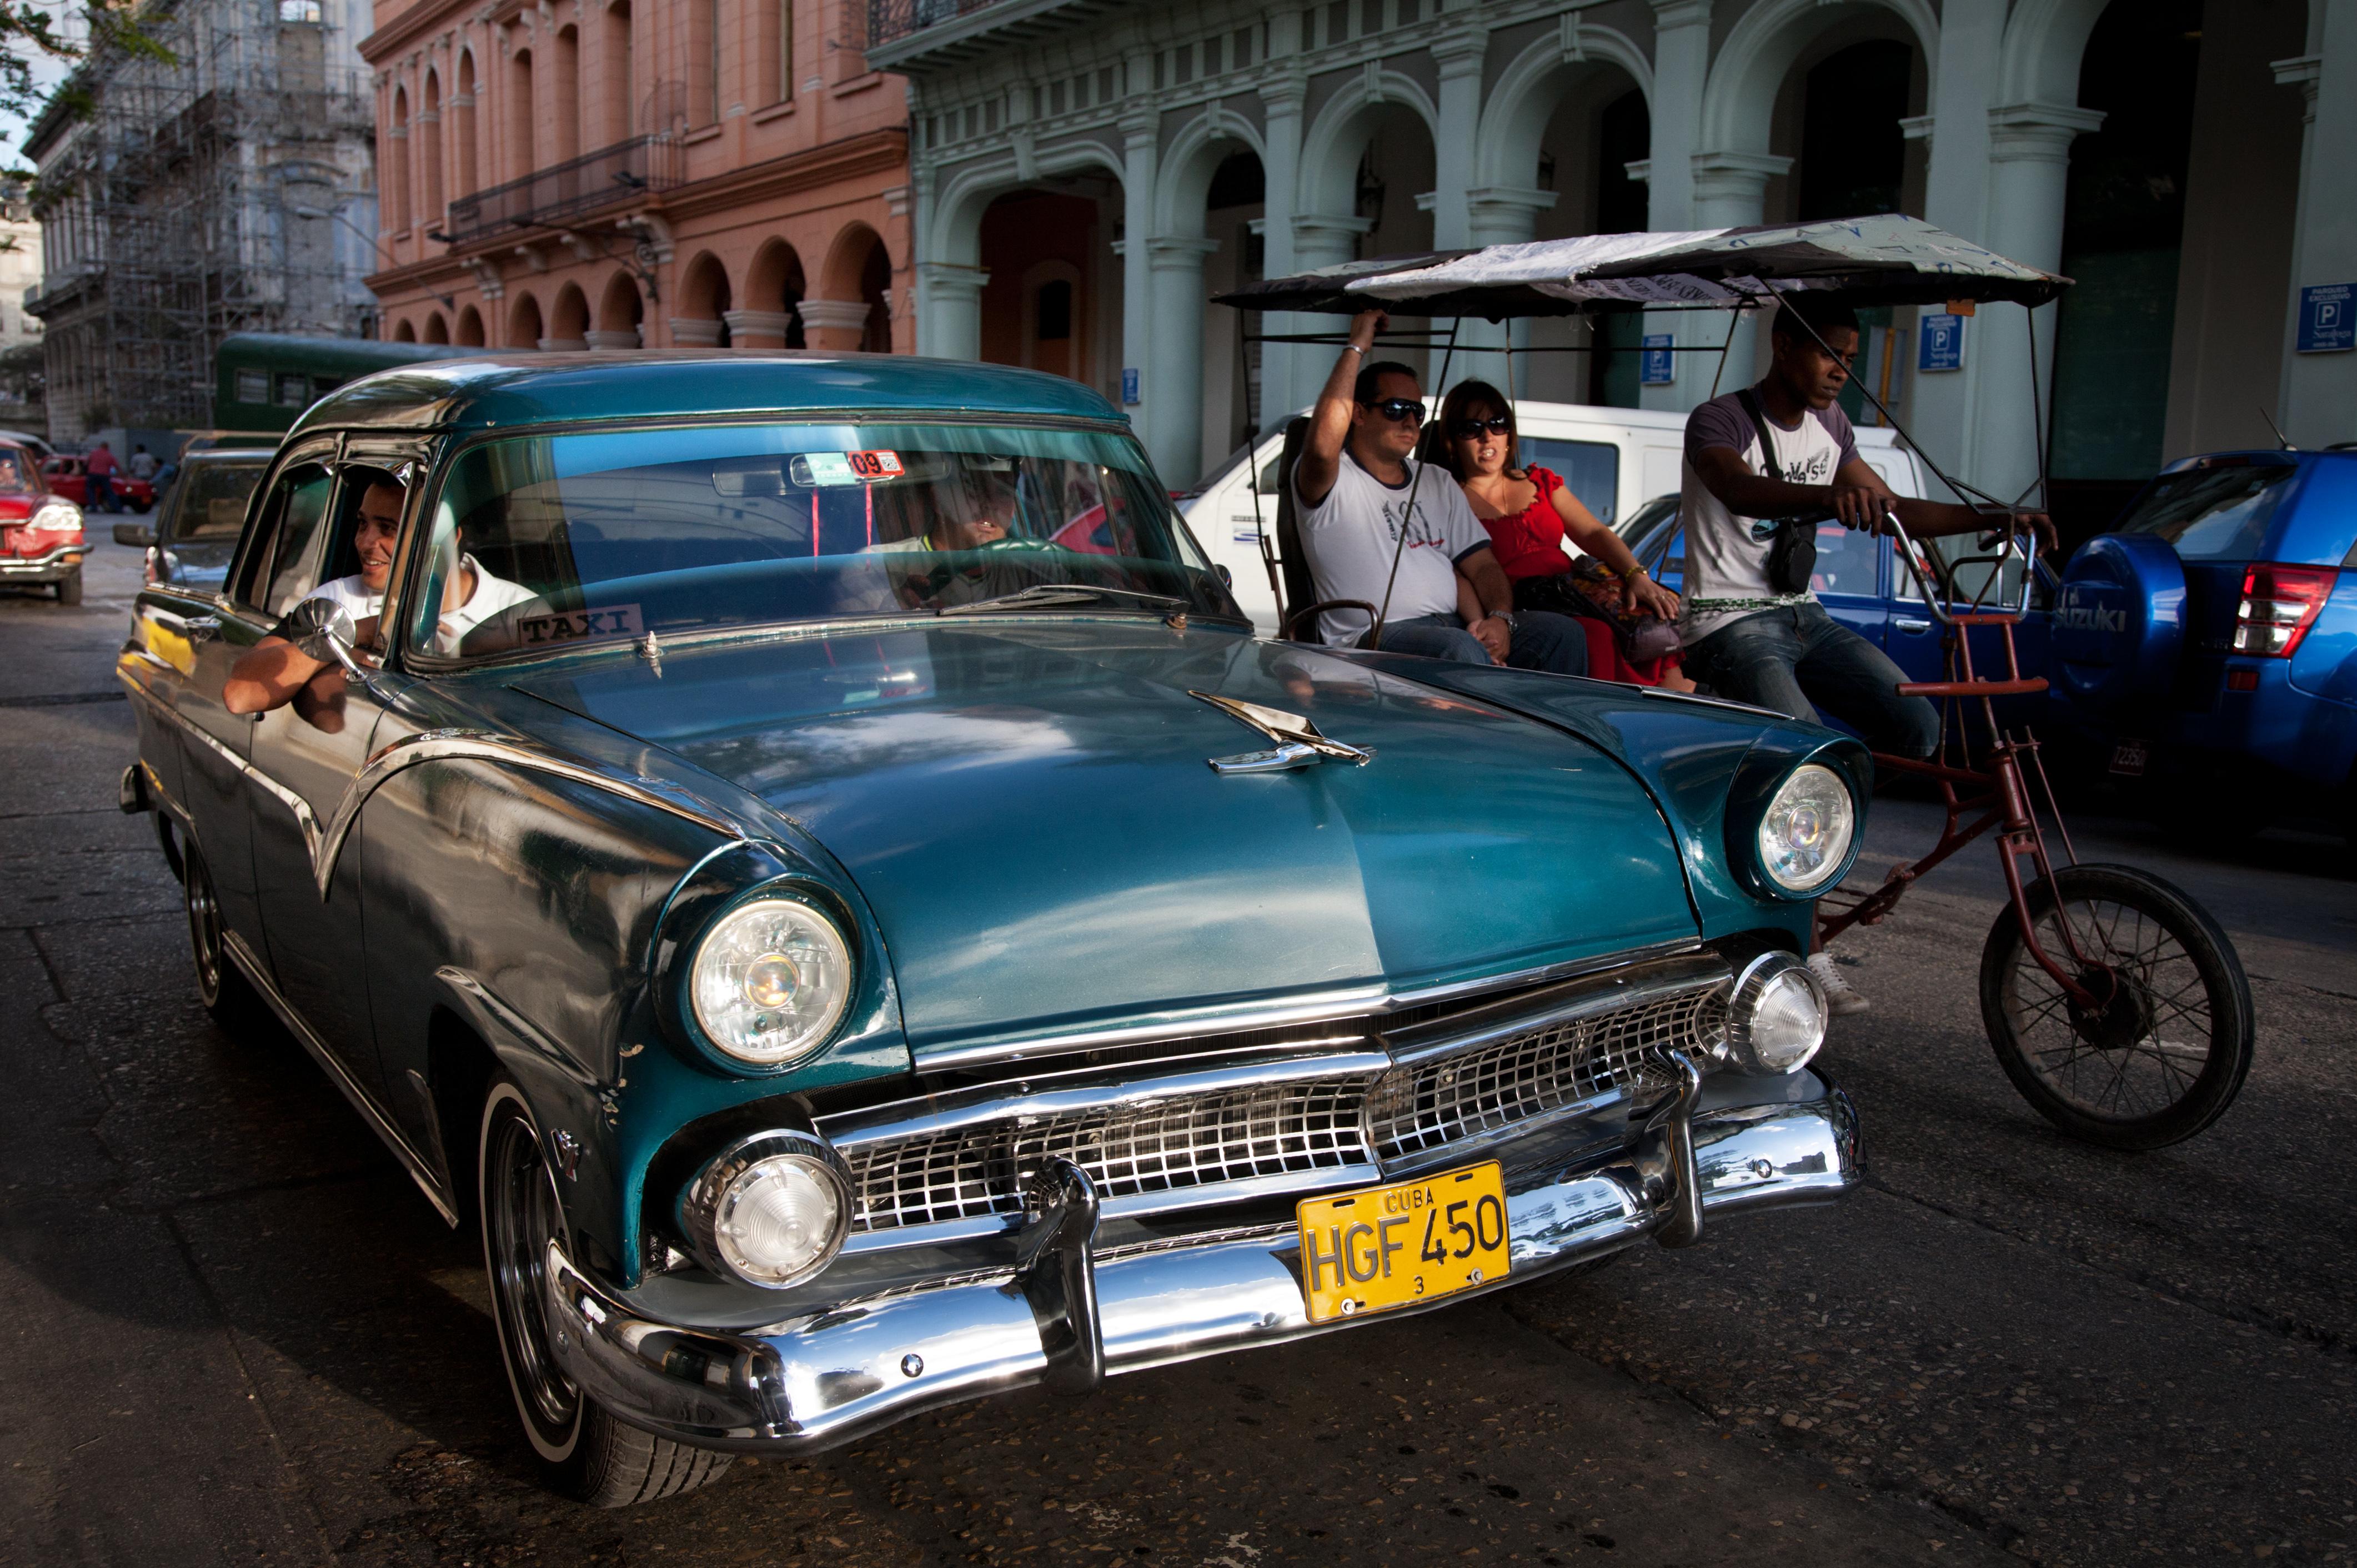 File:Havana - Cuba - 1366.jpg